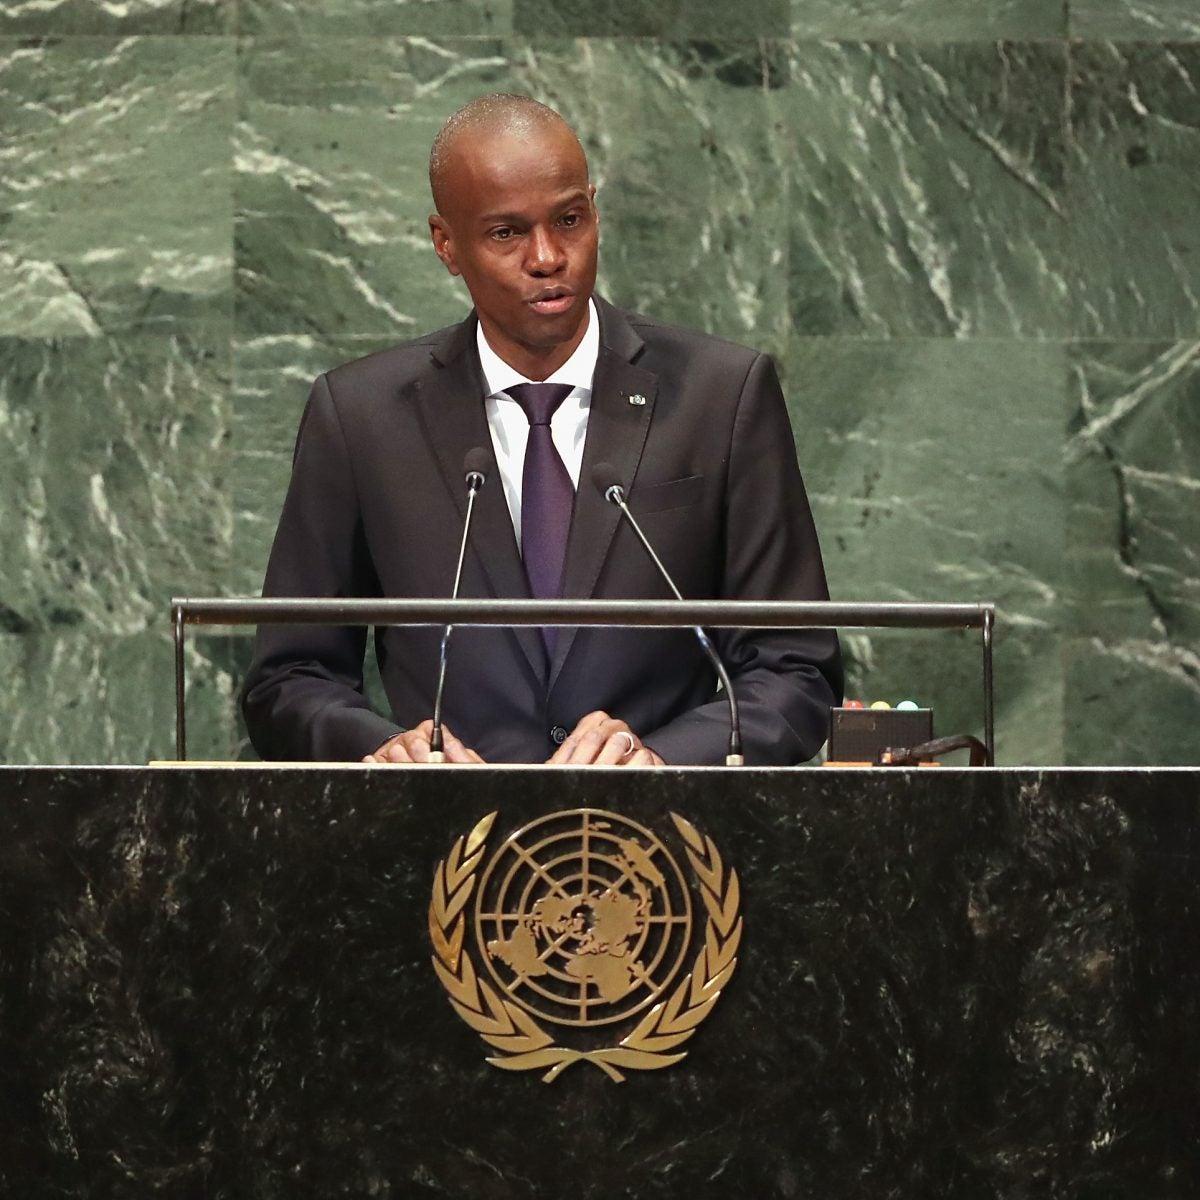 Haiti's President Assassinated